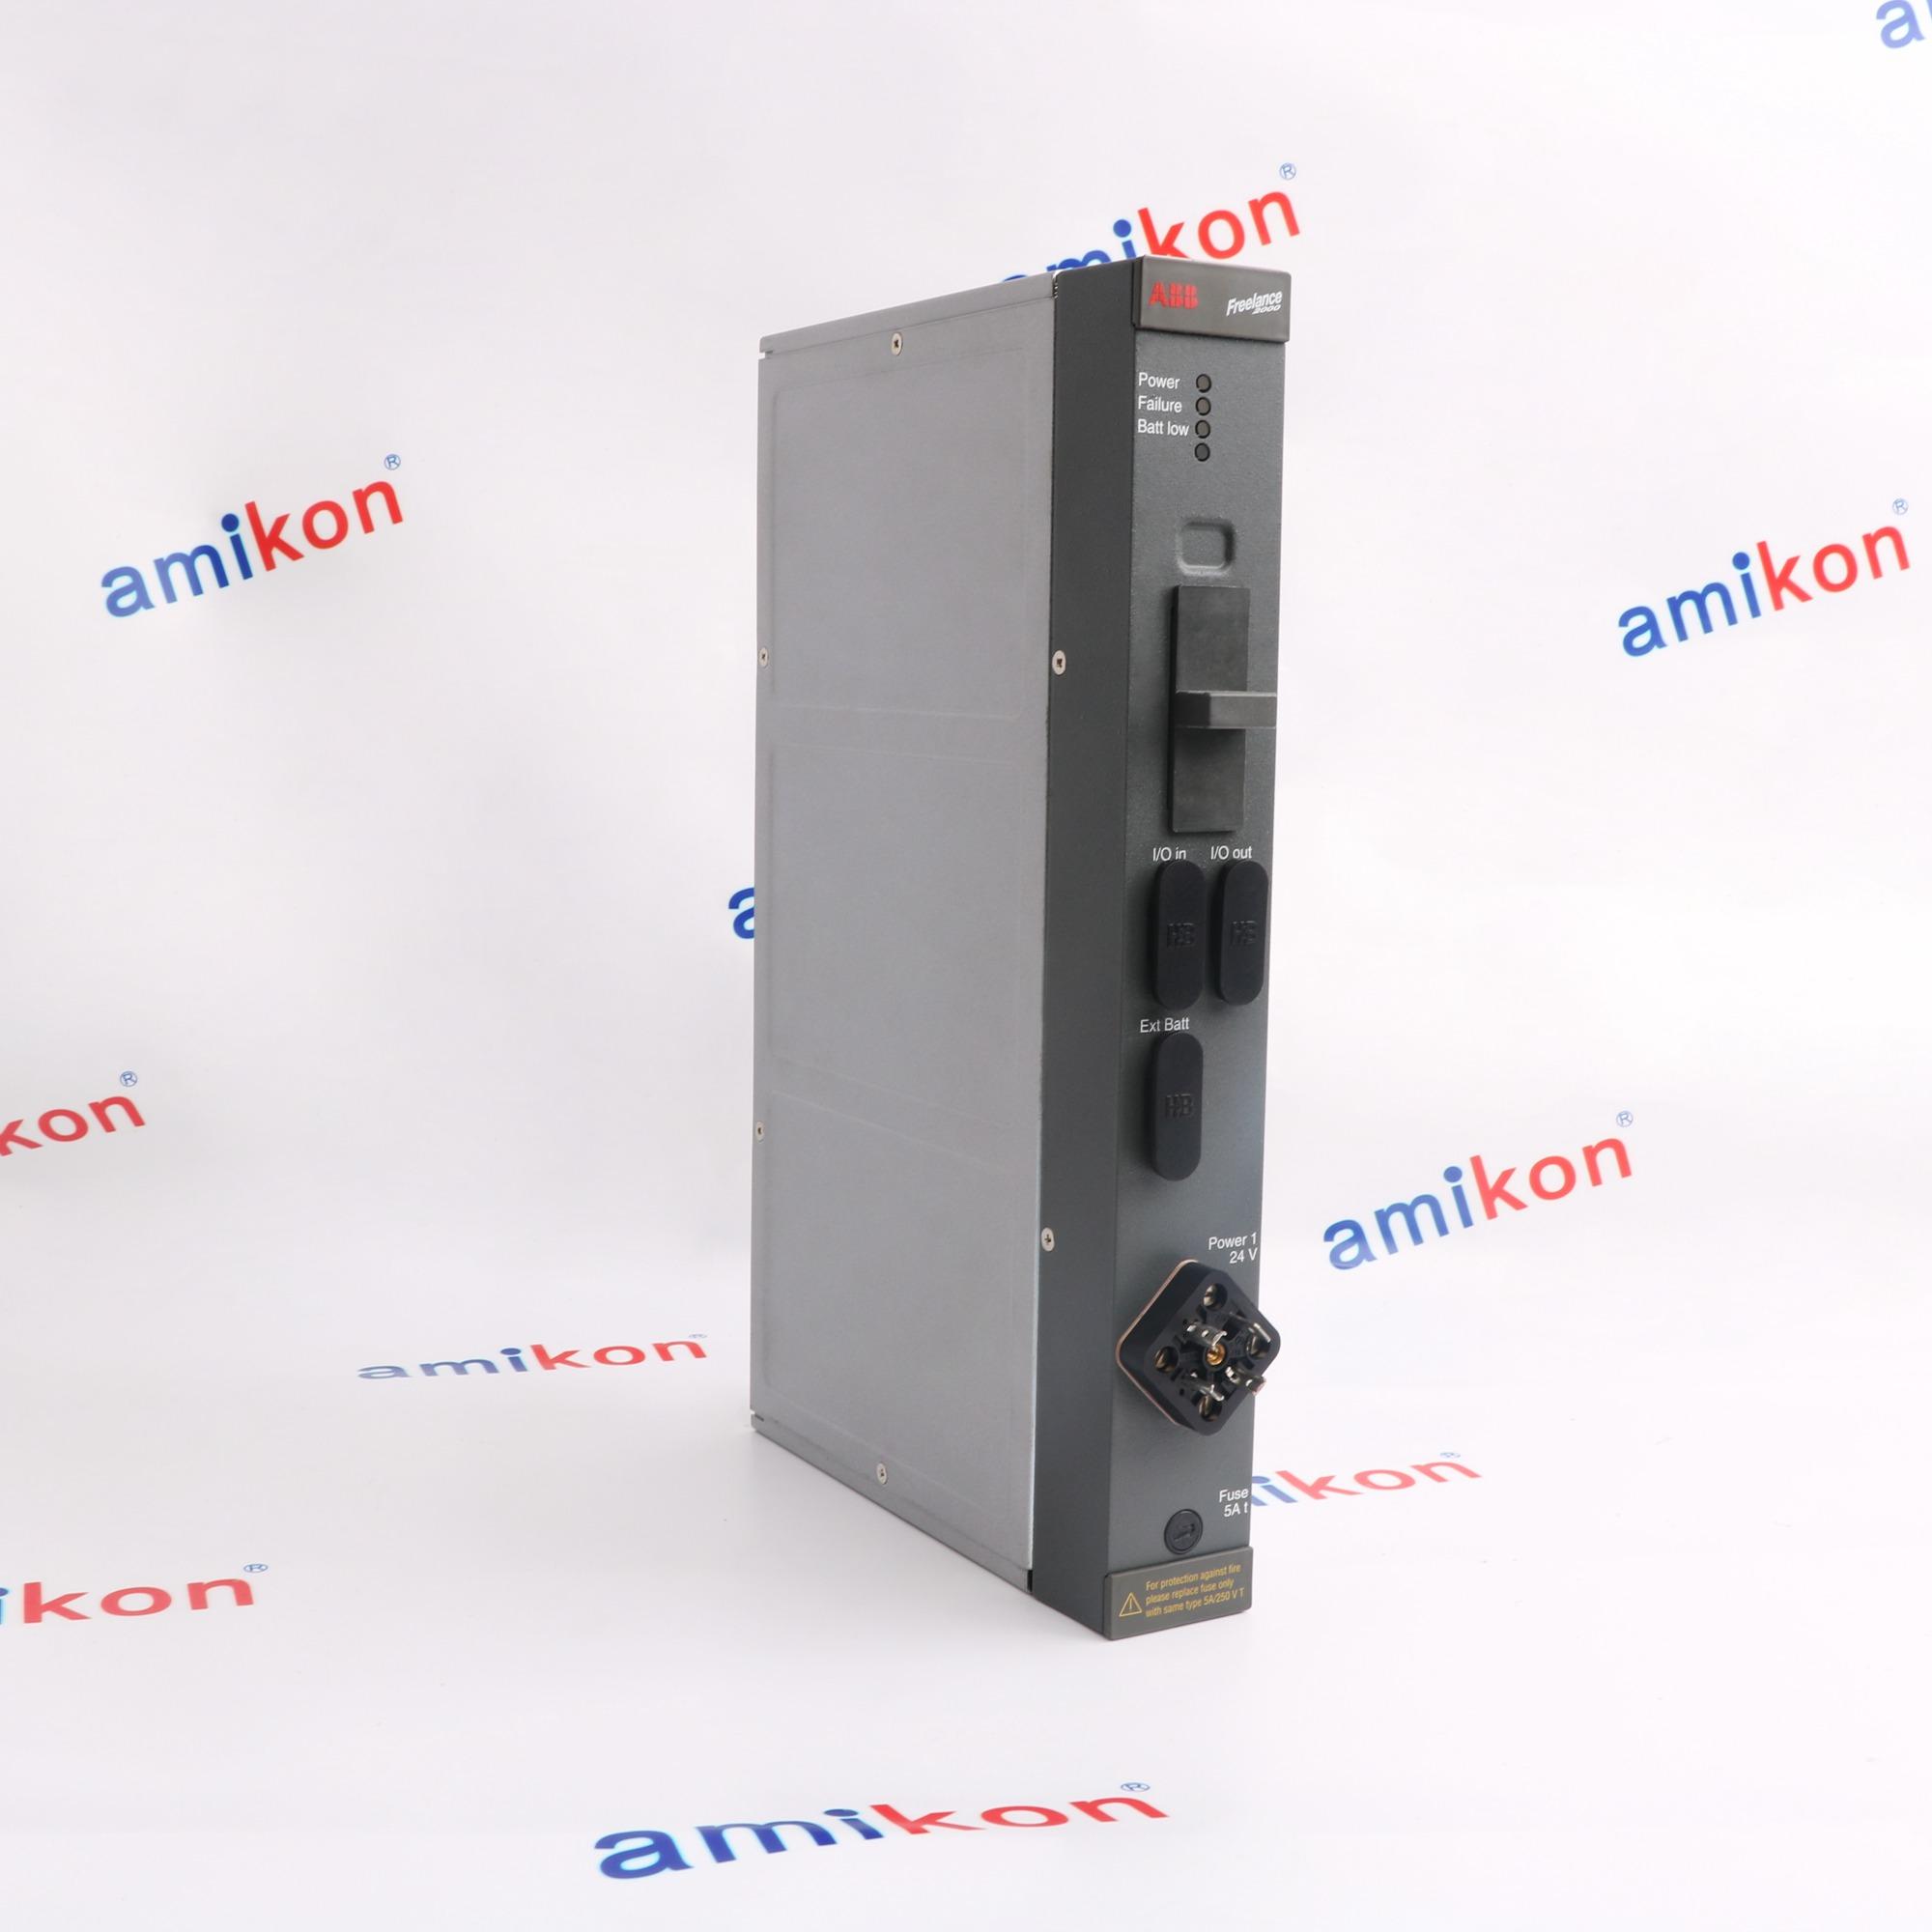 ABB,DLM01,4x20.5x31cm,1.6kg3